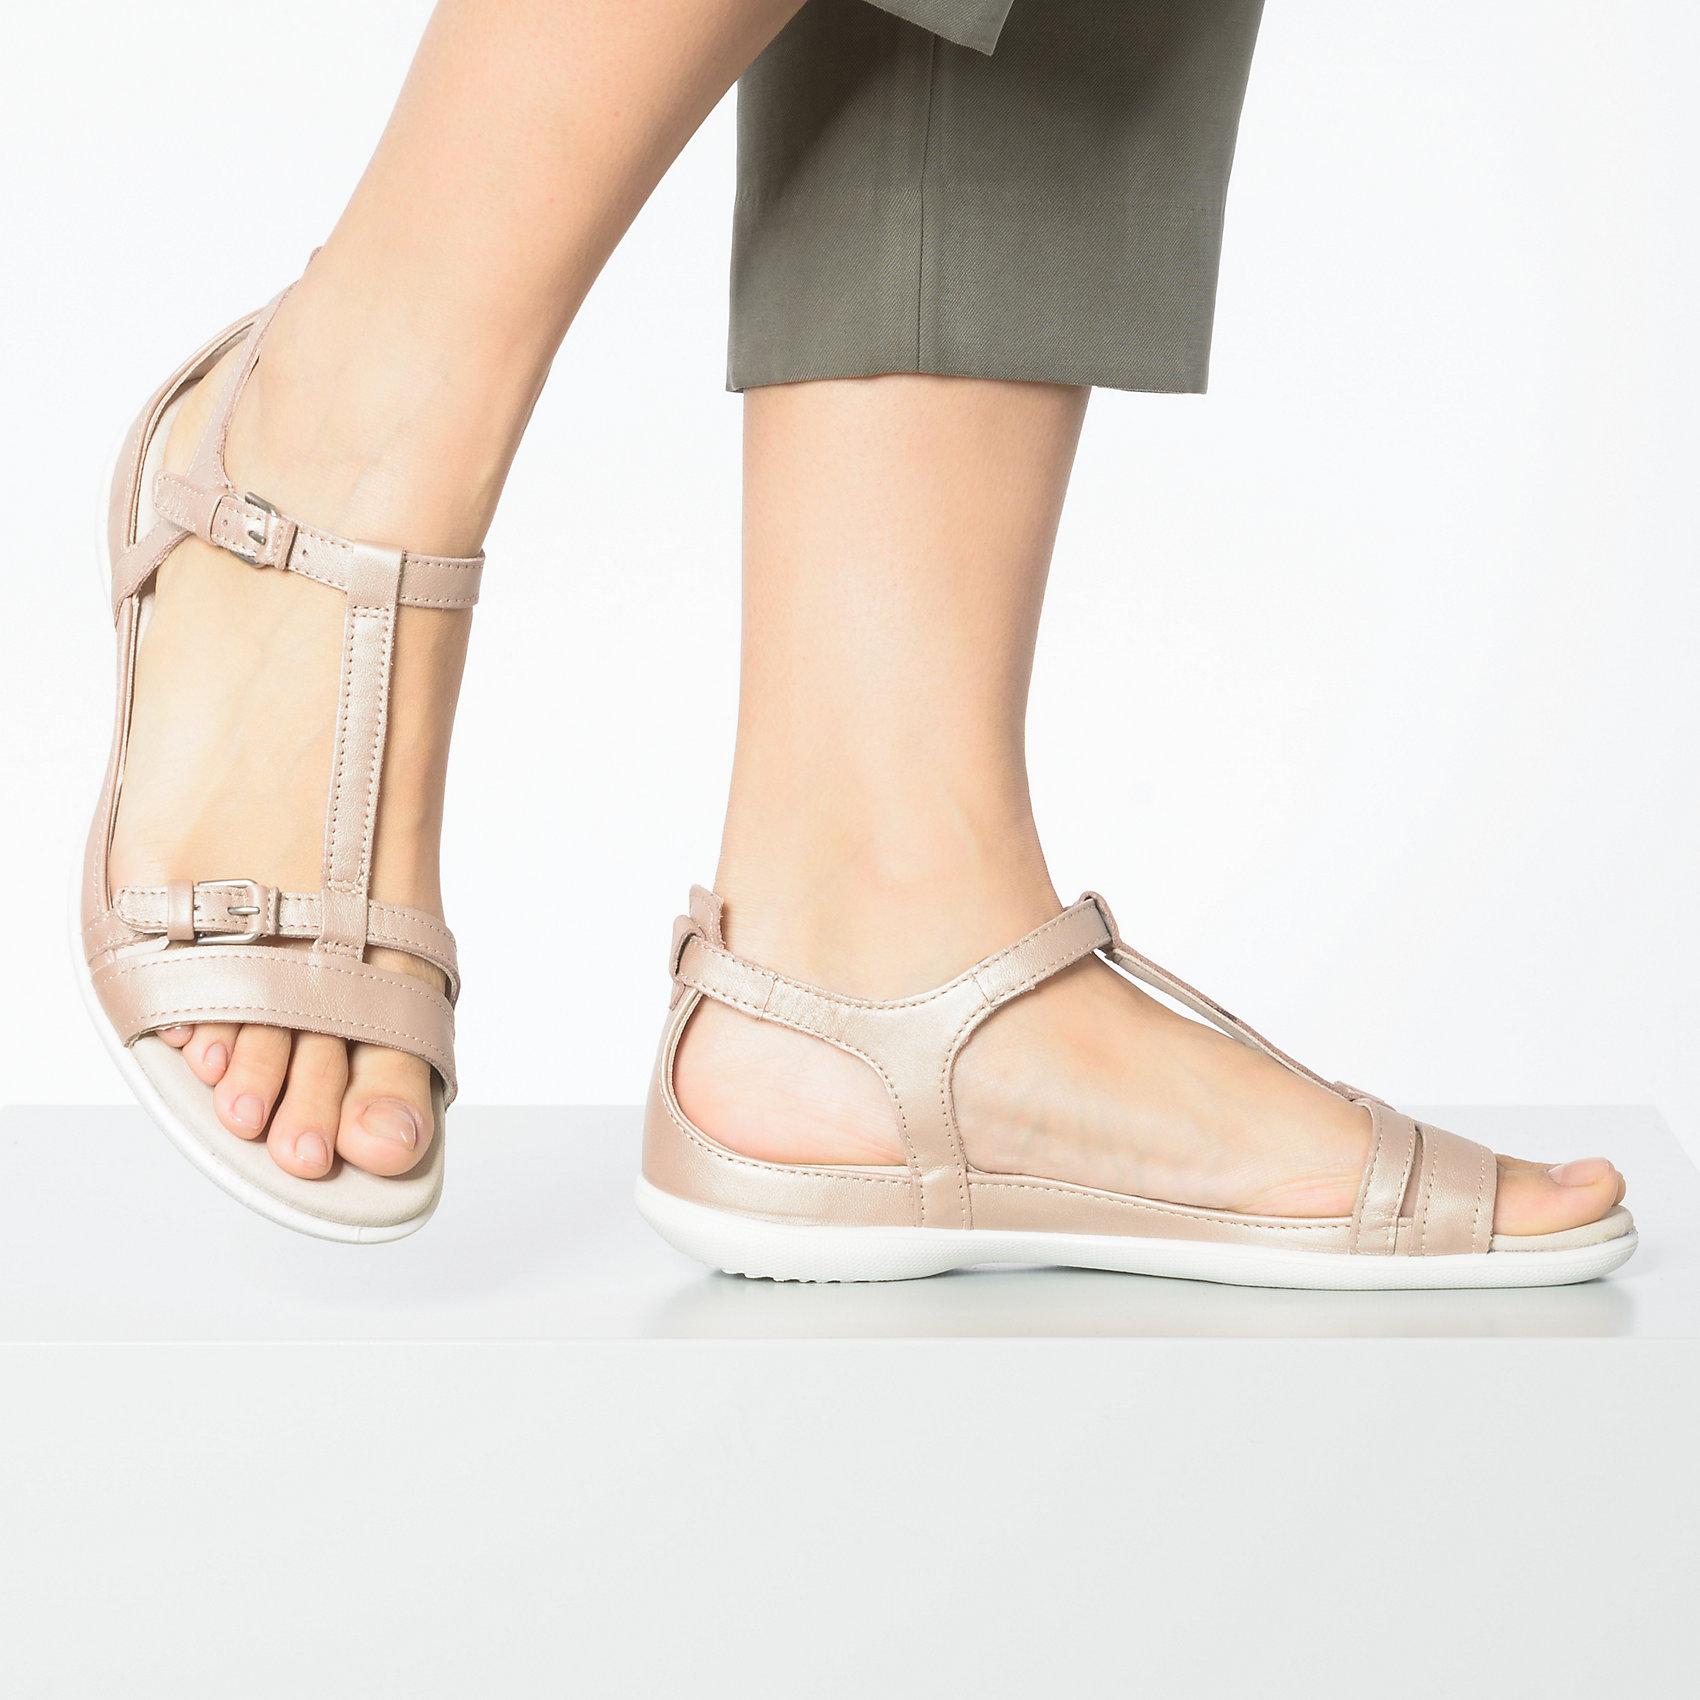 ecco, Ecco Flash Komfort Sandalen, schwarz